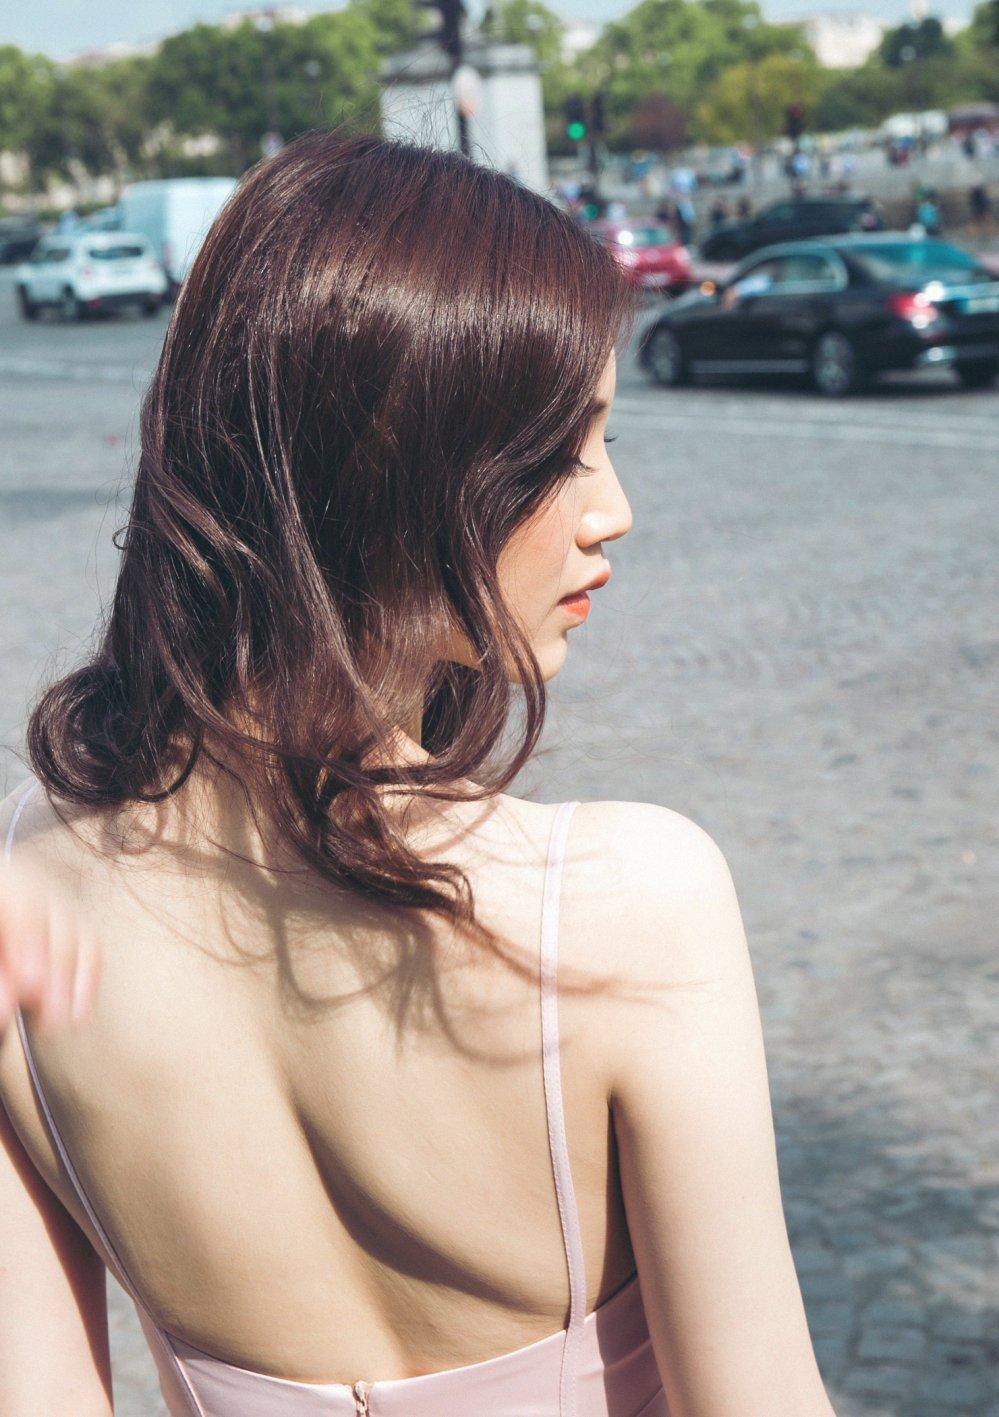 Hoa hau Ao dai 2018 Phi Thuy Linh khoe ong xa doanh nhan dien trai hinh anh 8